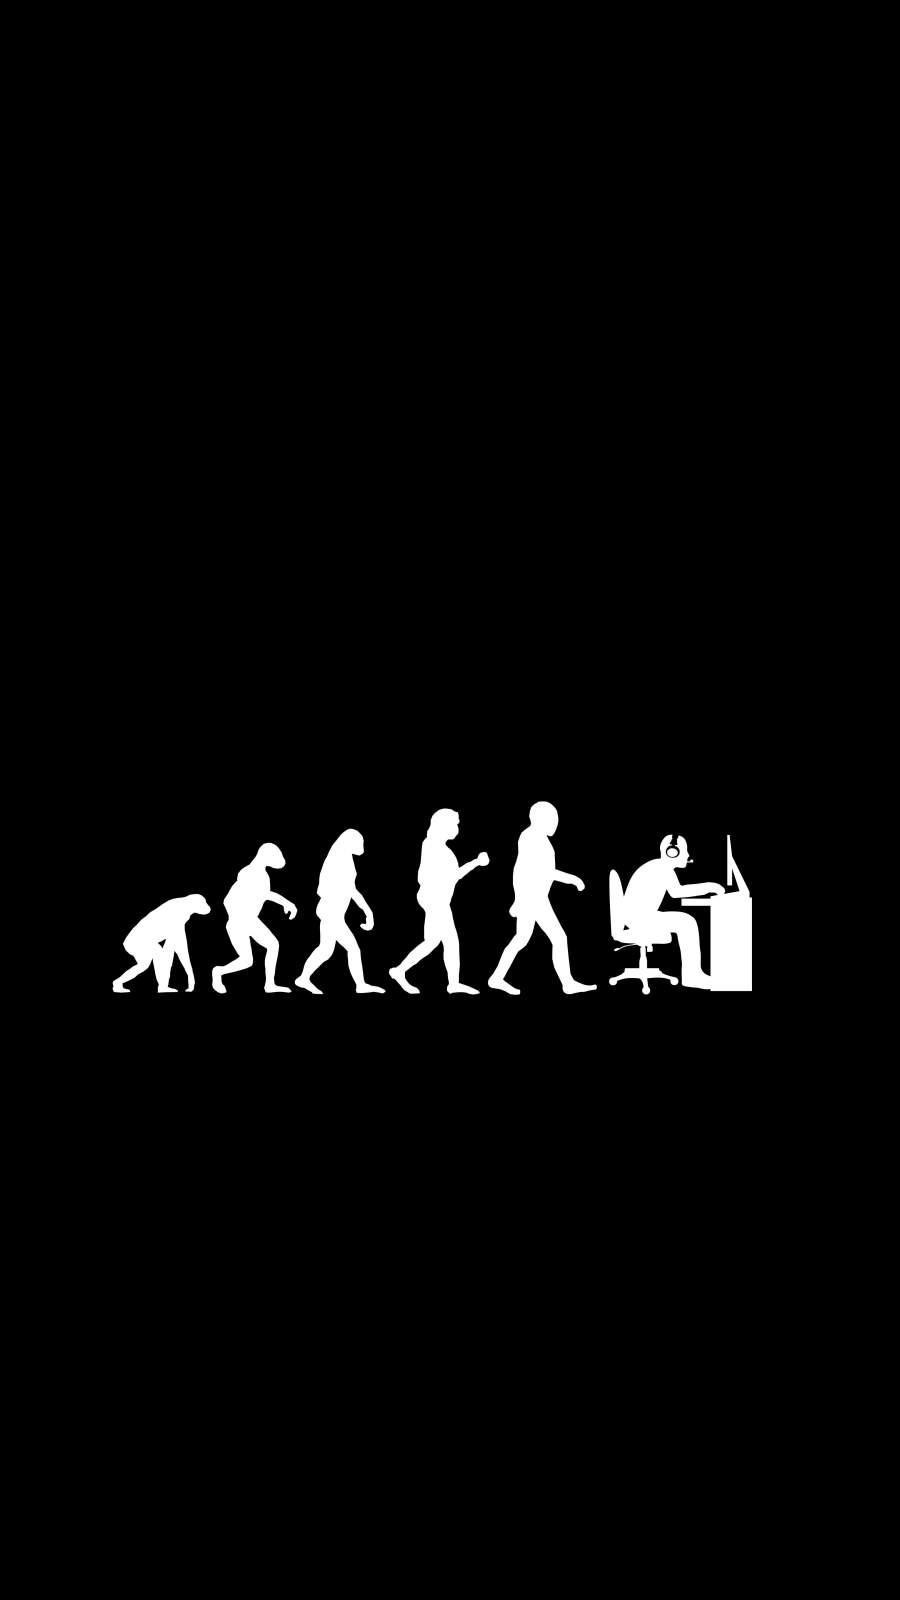 Human Evolution iPhone Wallpaper